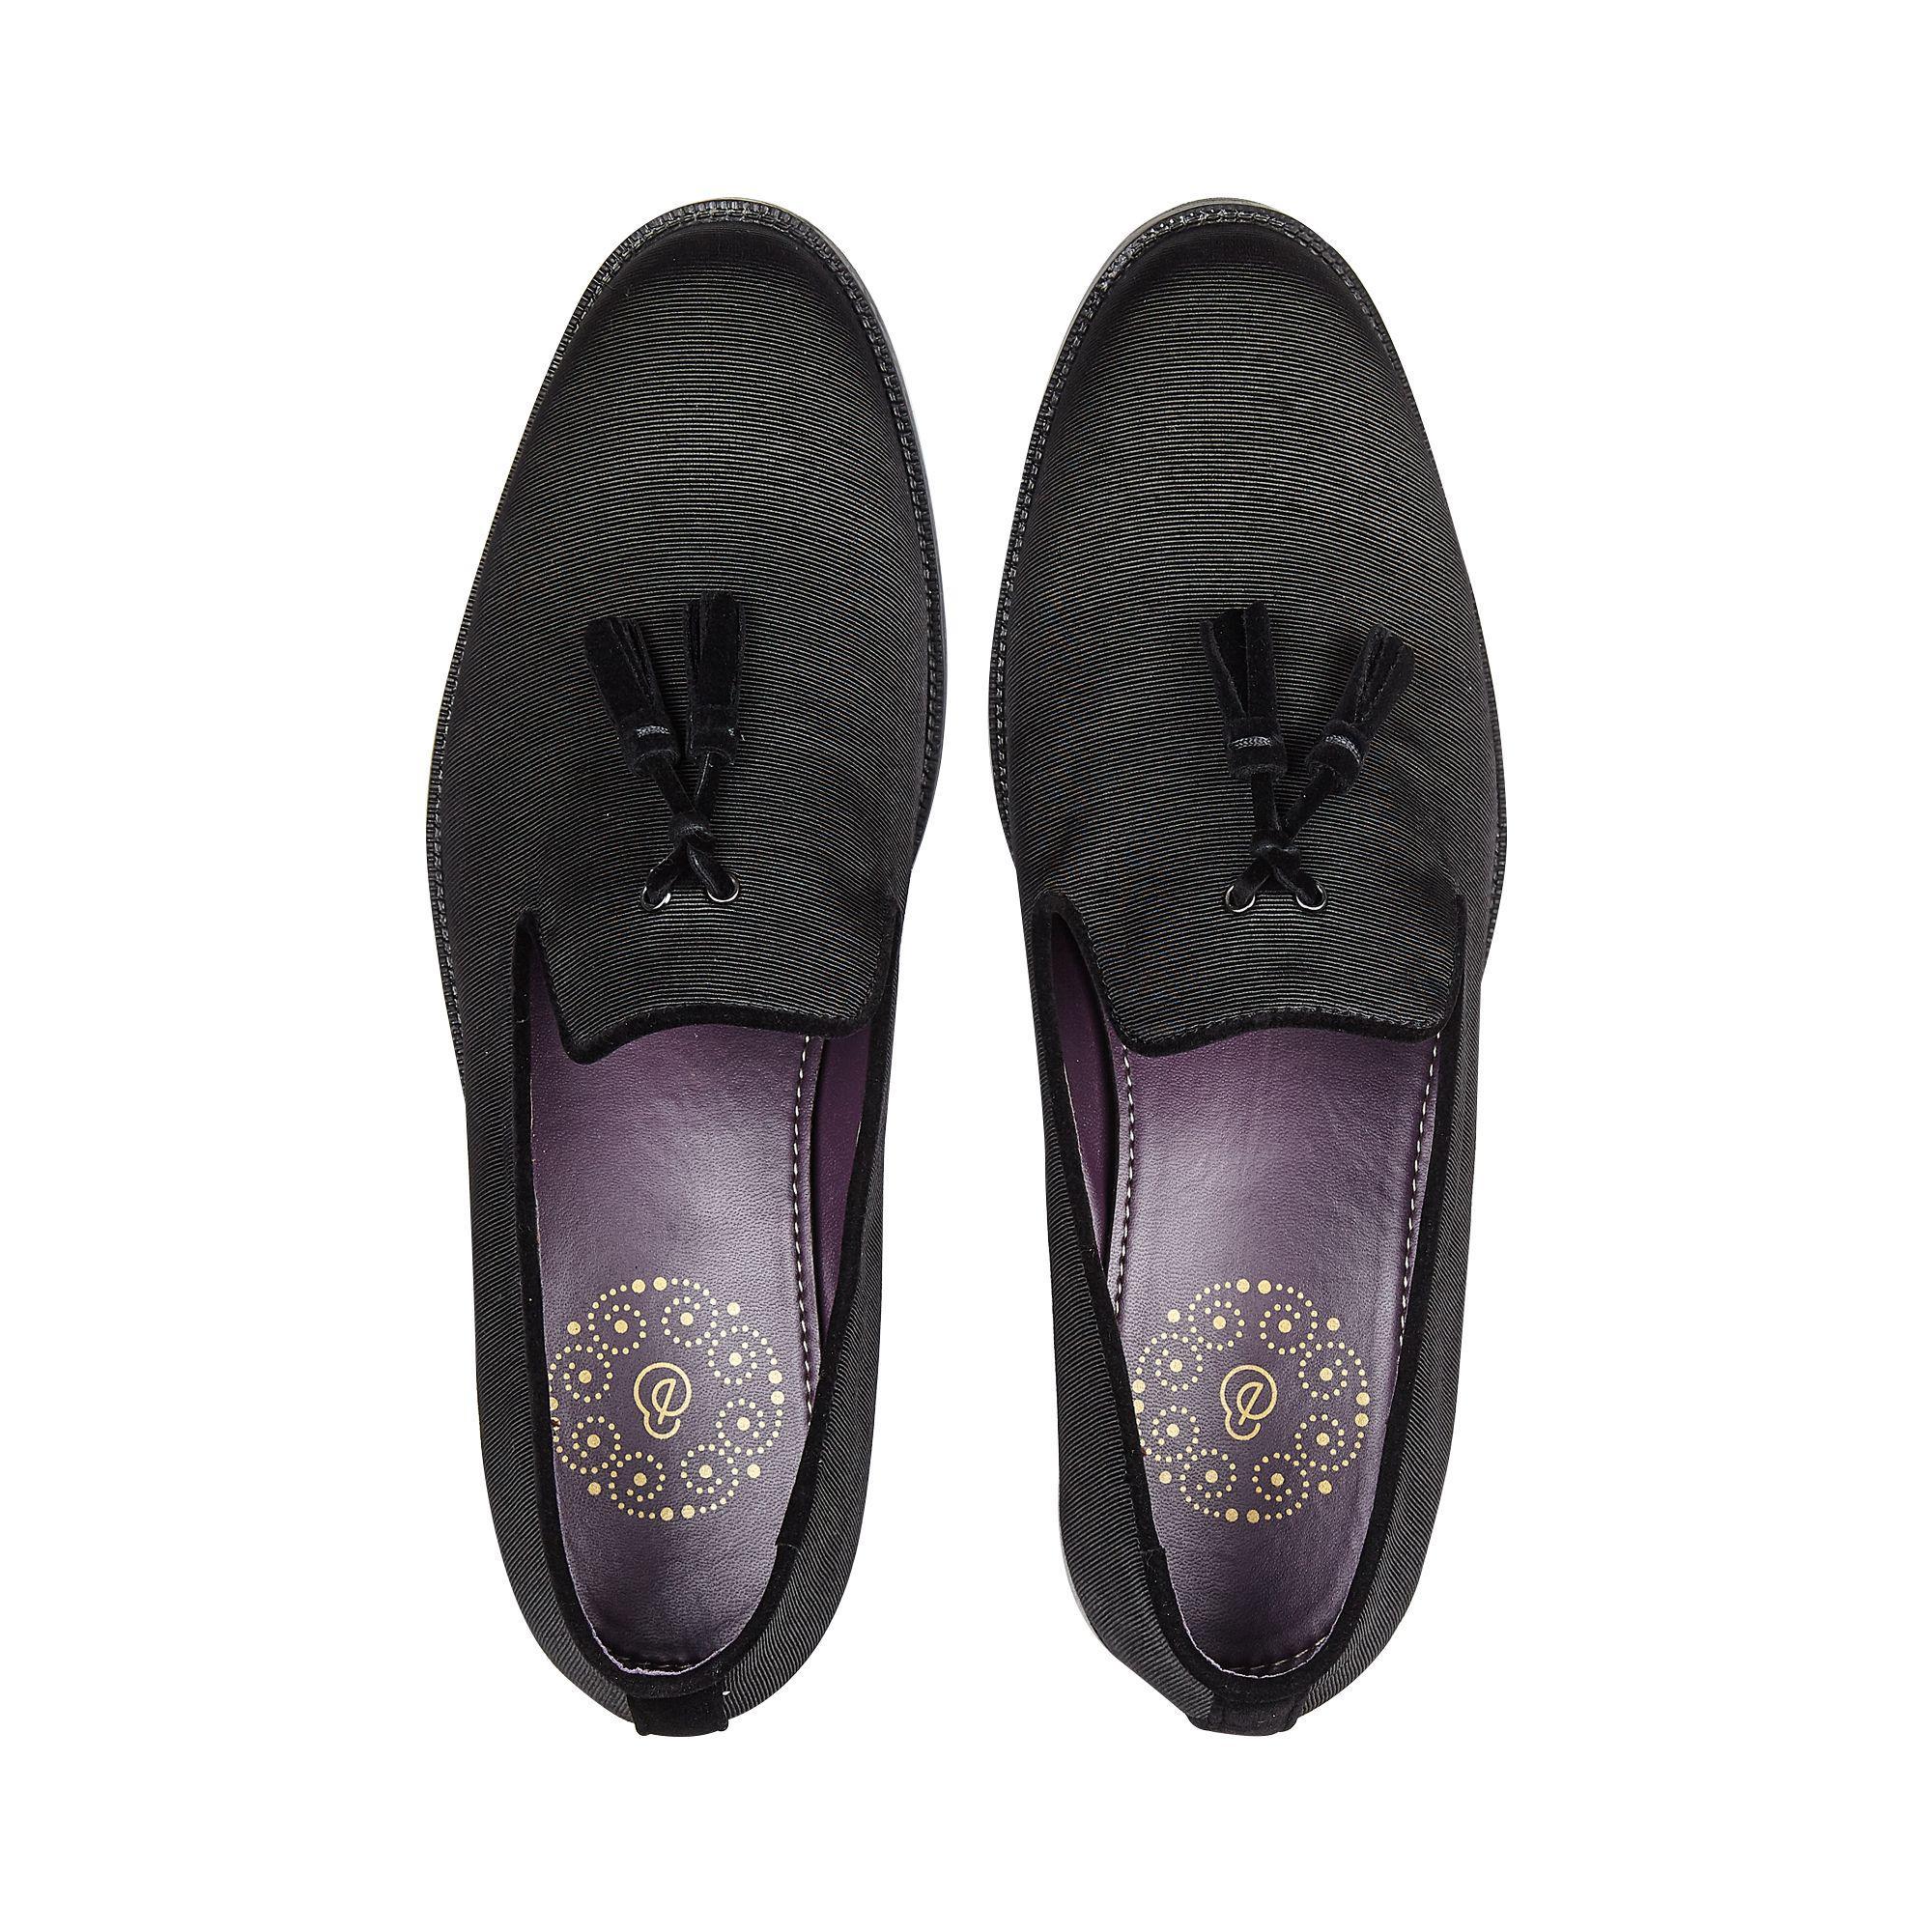 Burton Black Dress Loafers for Men